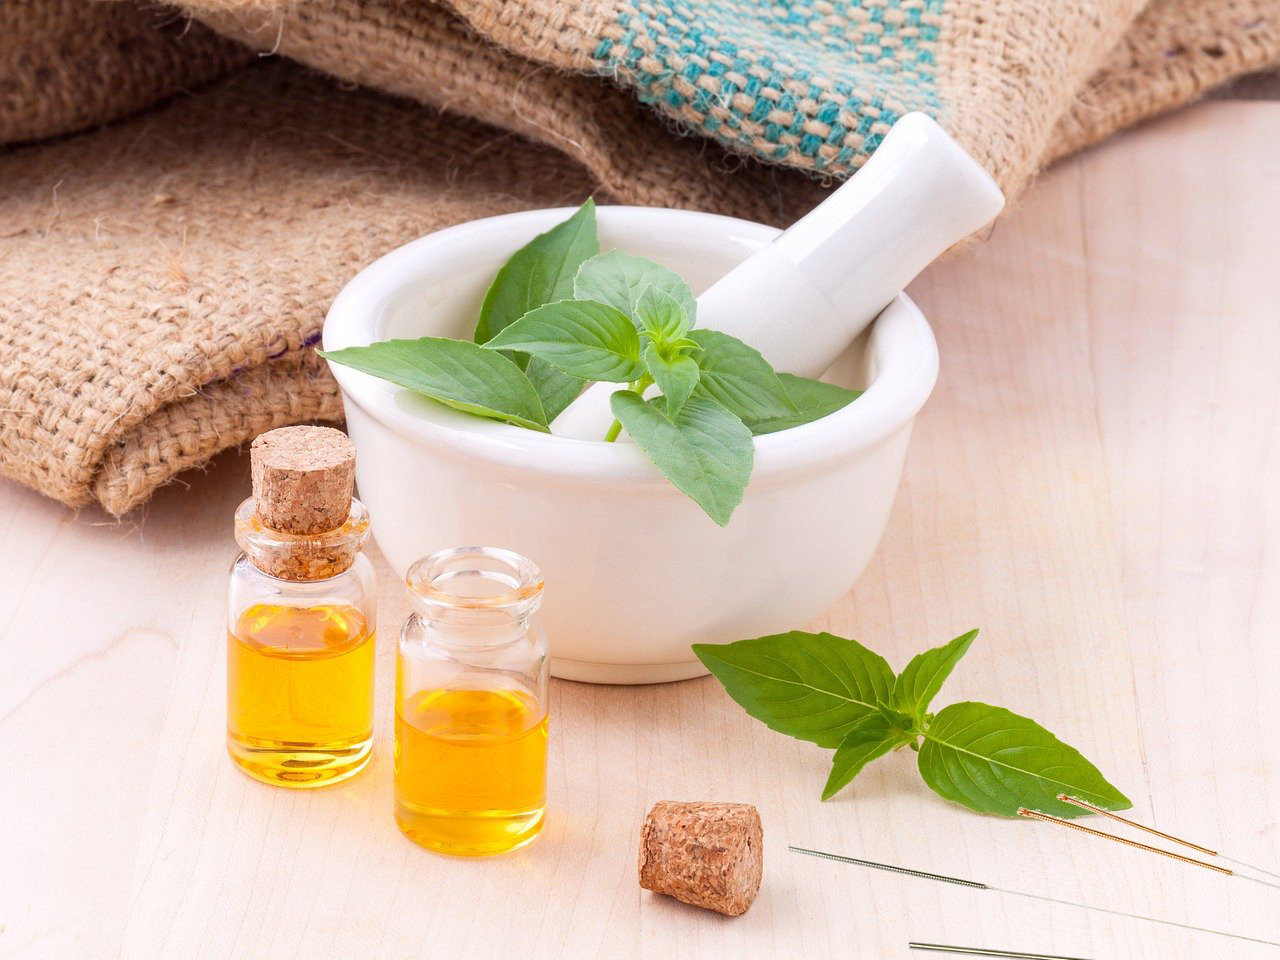 Natural remedies_alternative treatment